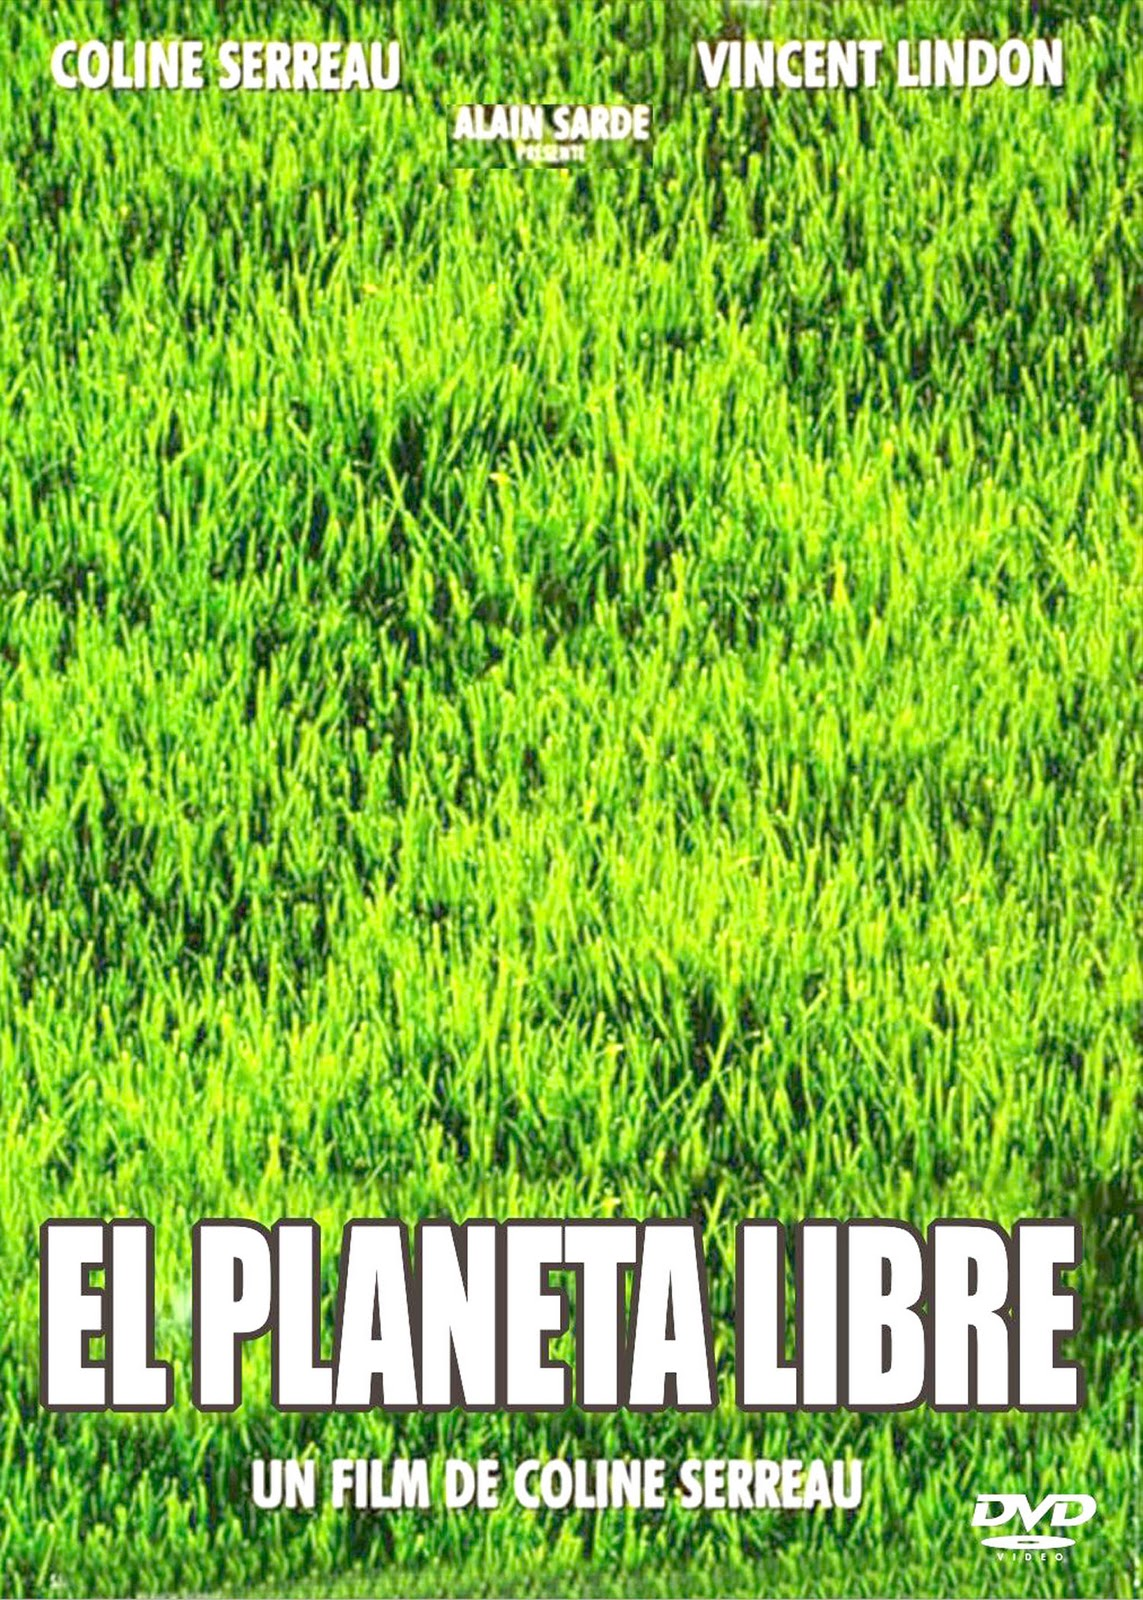 http://1.bp.blogspot.com/-KrHzQAwL2Y4/T1zb5VJerHI/AAAAAAAAAco/NVCteVLOxiU/s1600/El+Planeta+Libre.jpg